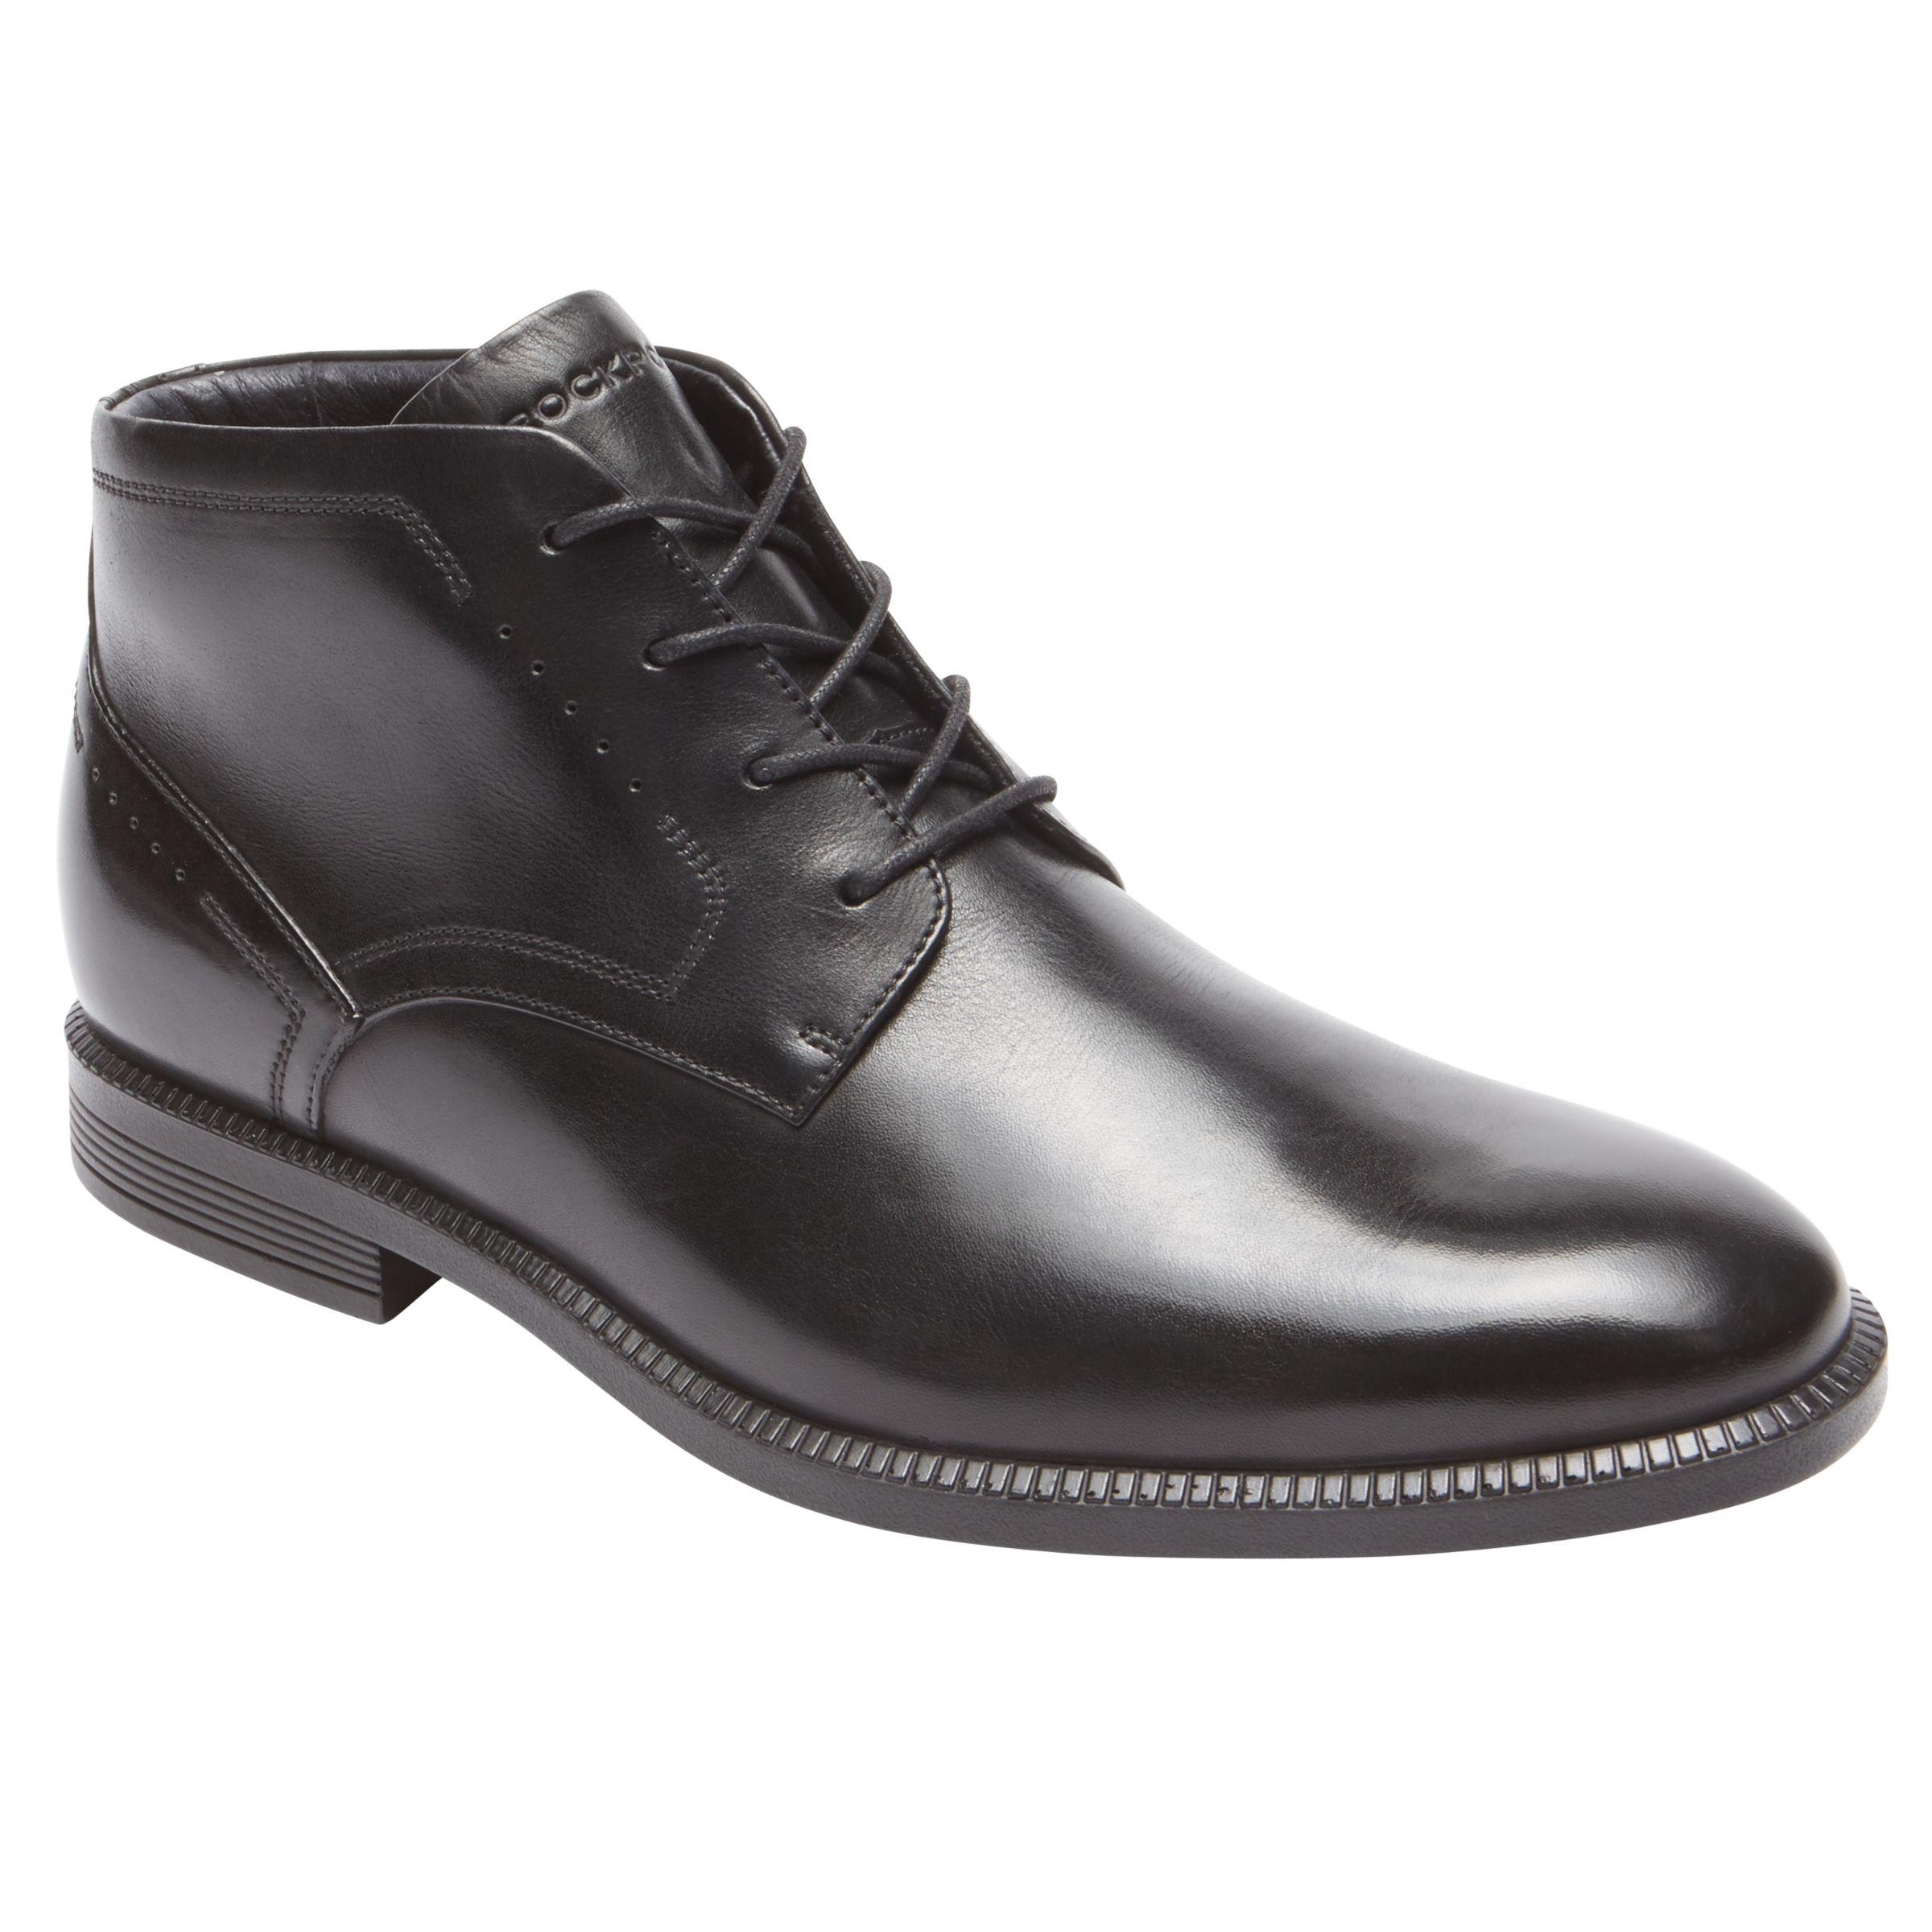 Rockport Rockport Dressports Mid-Chukka Boots